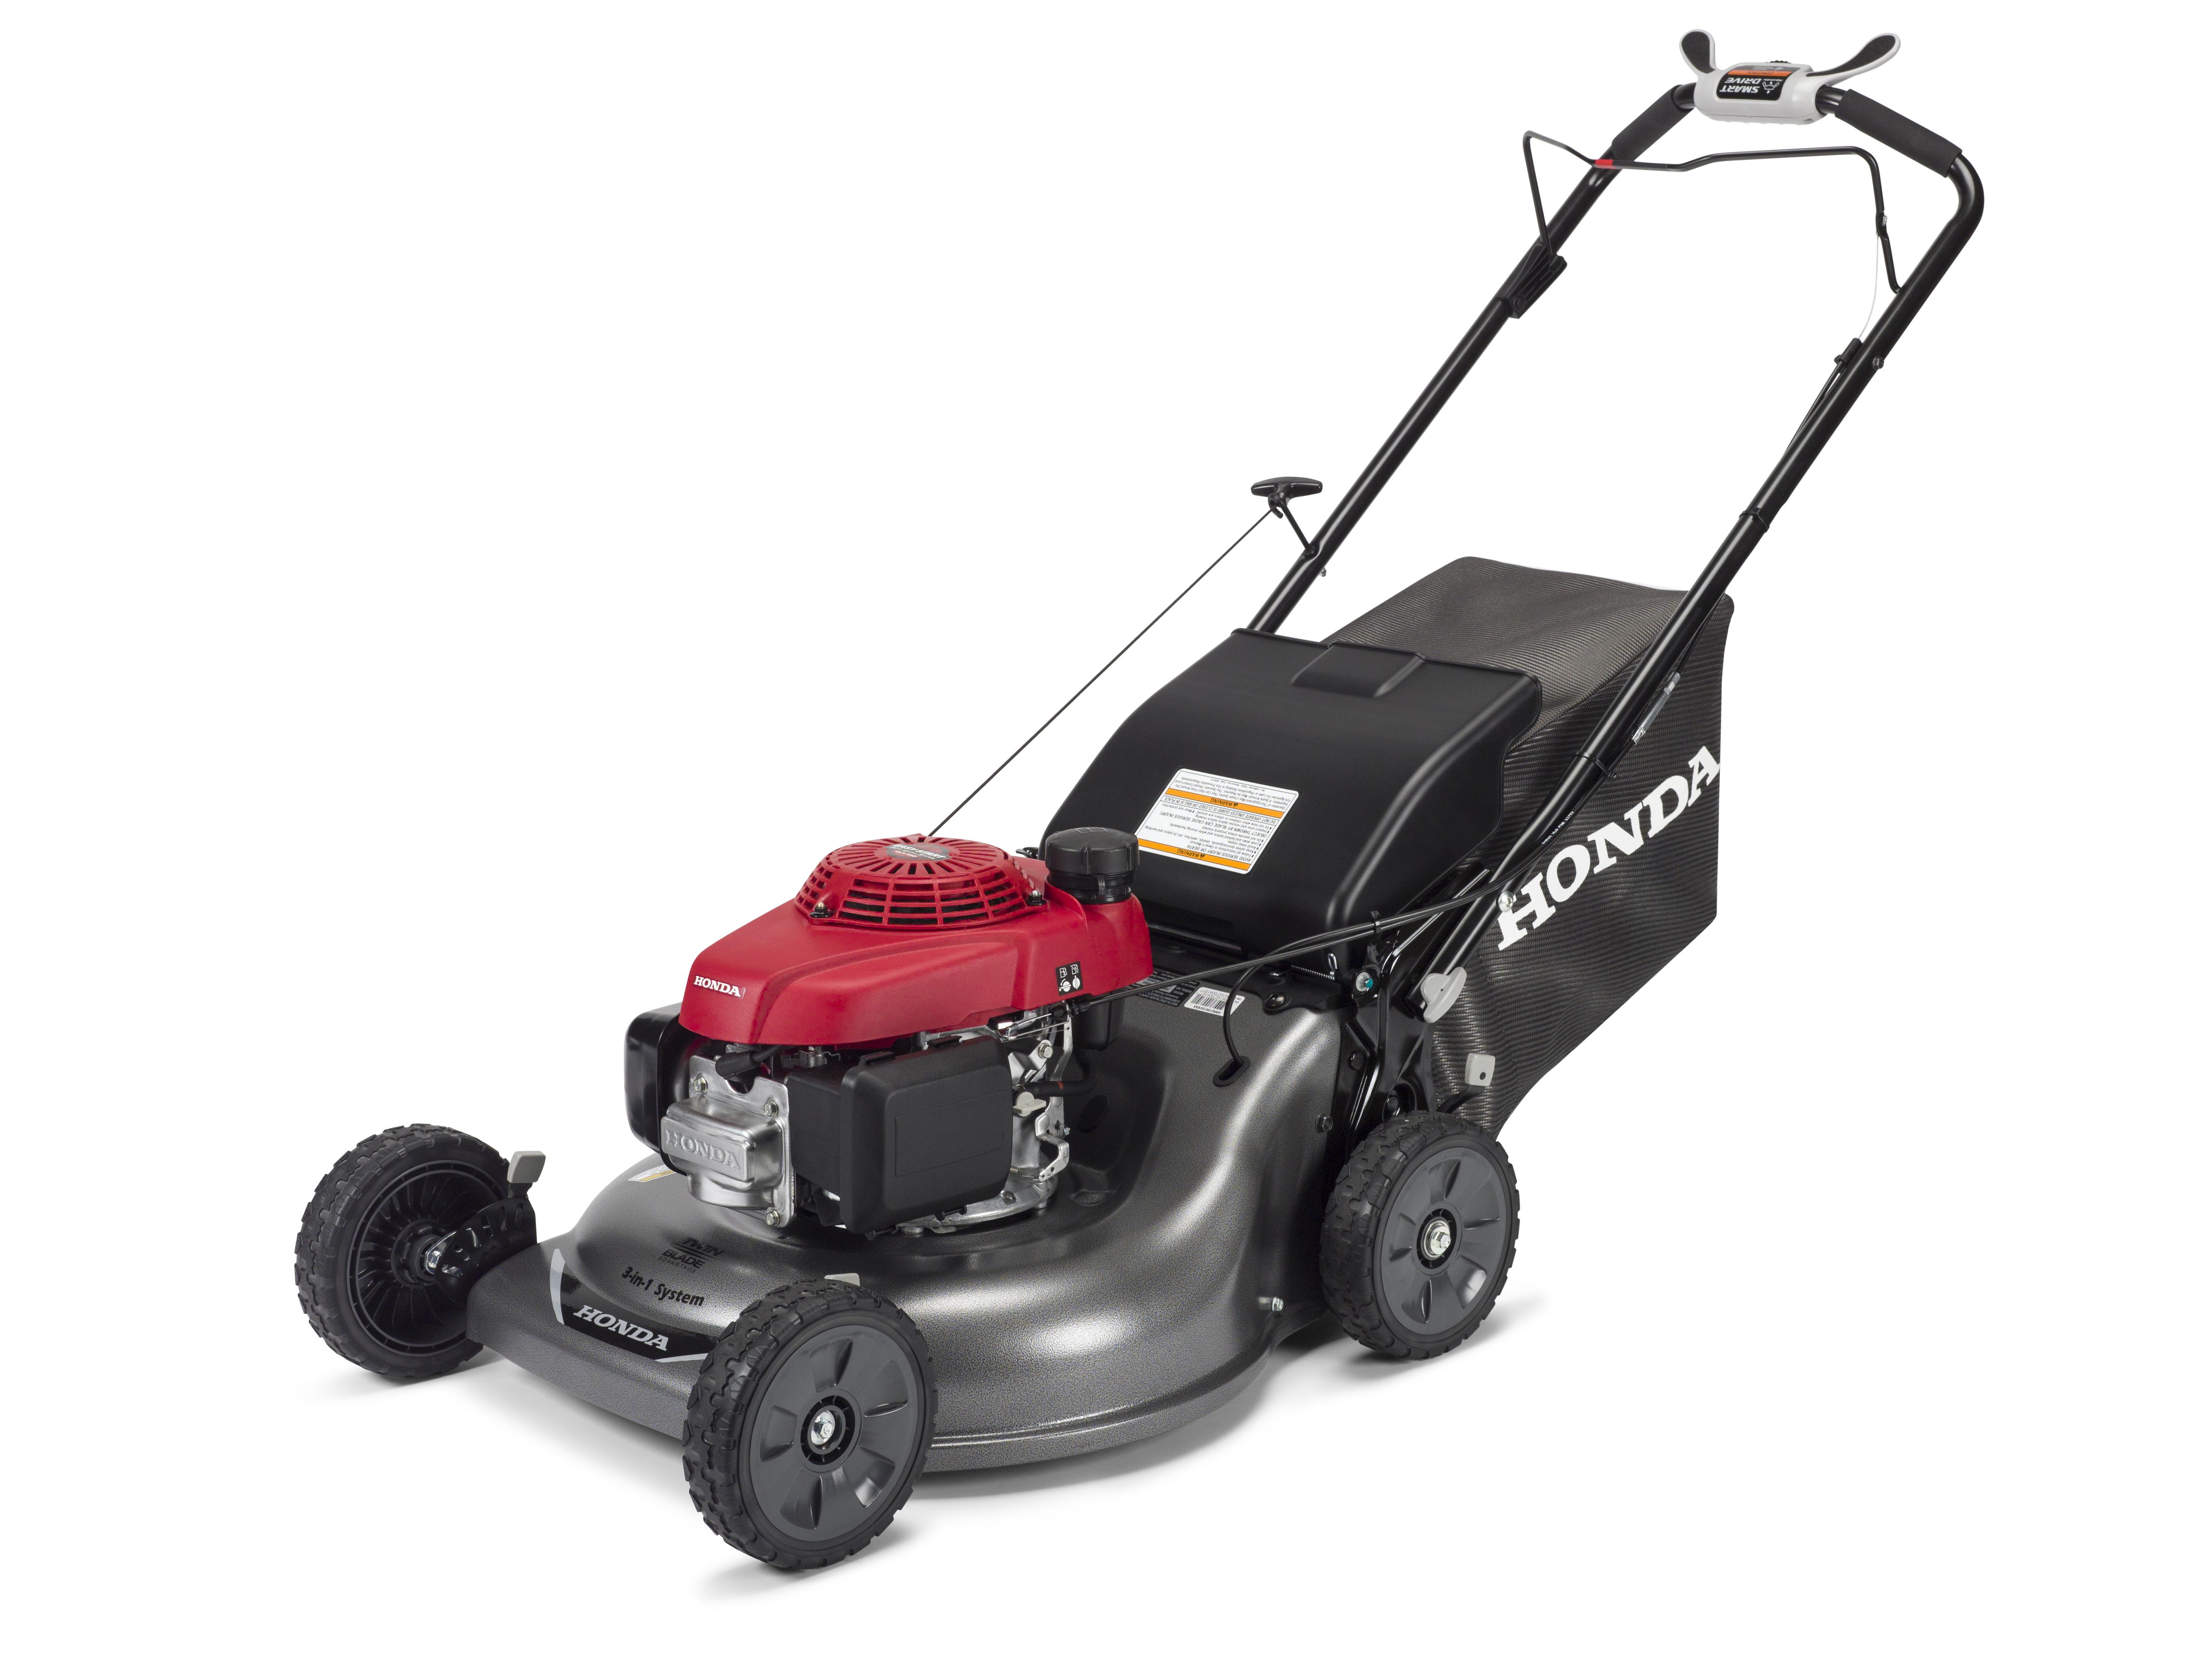 propelled lawn hrx mower buckeye control self cruise deck power parts walk honda behind nexiter with sales